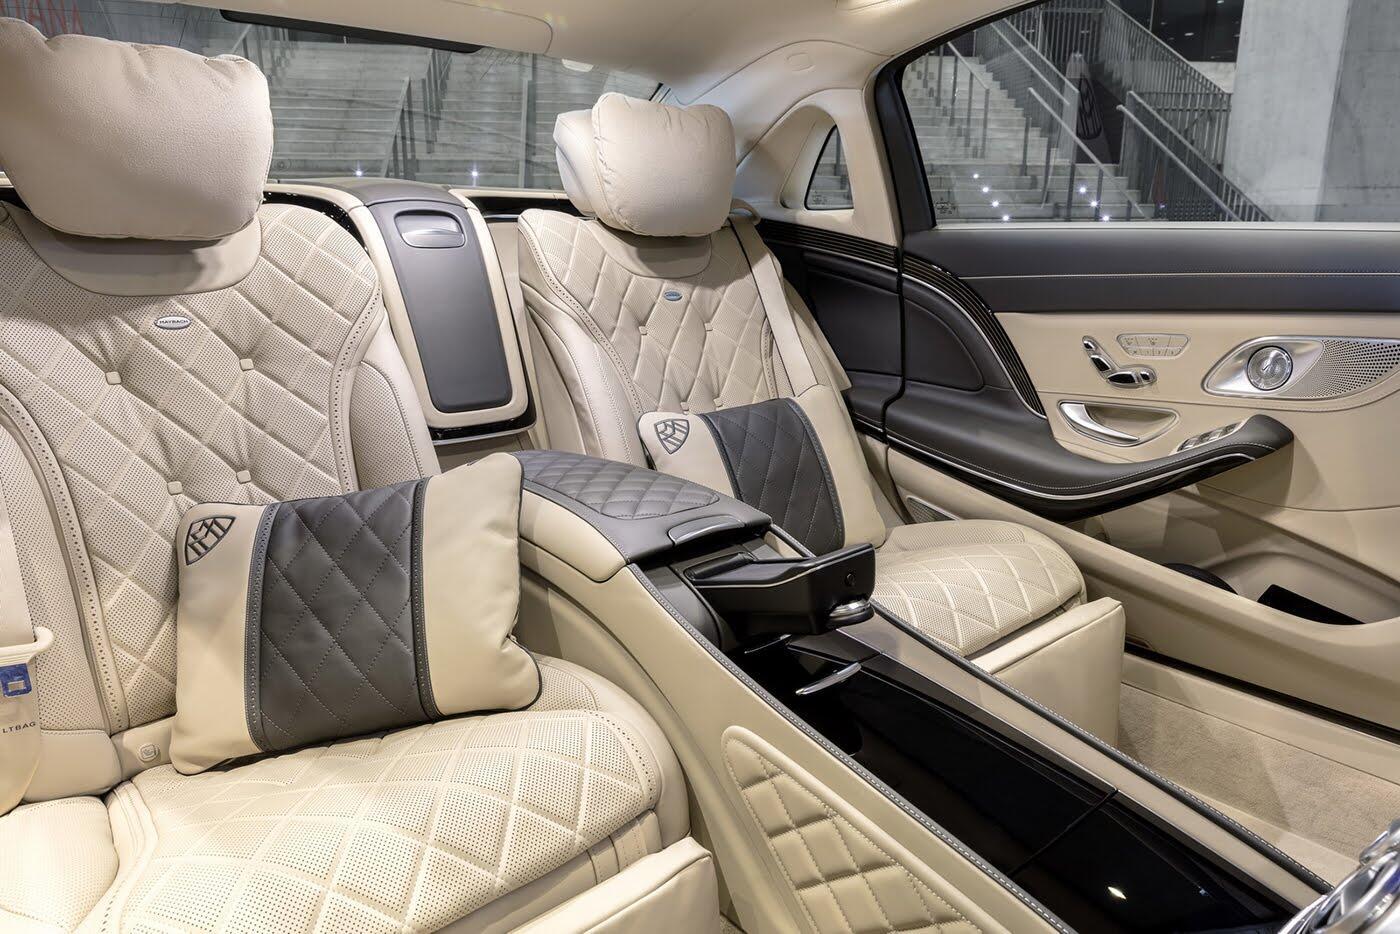 Ảnh chi tiết Mercedes-Benz S-Class 2018 - Hình 16